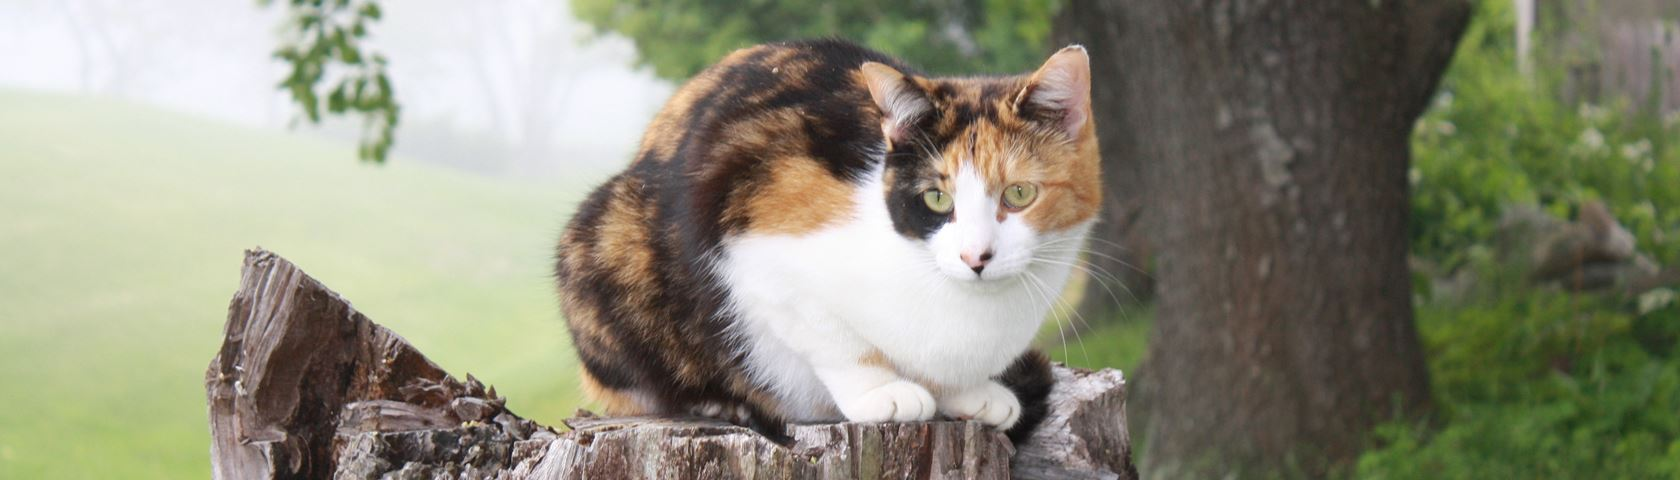 Calico Kitty on a Treestump